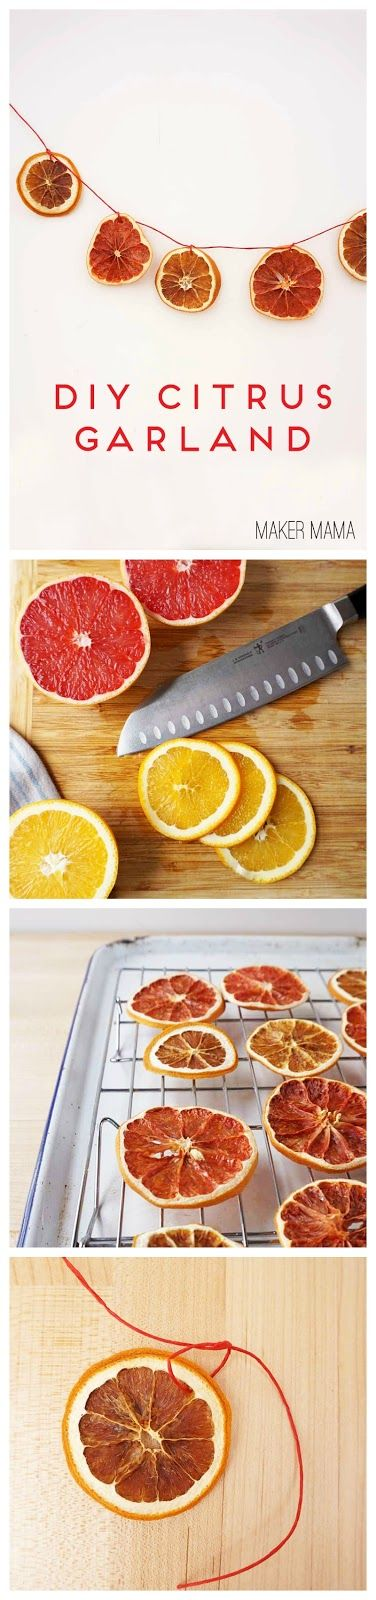 Maker Mama Craft Blog: Citrus Garland and Ornaments